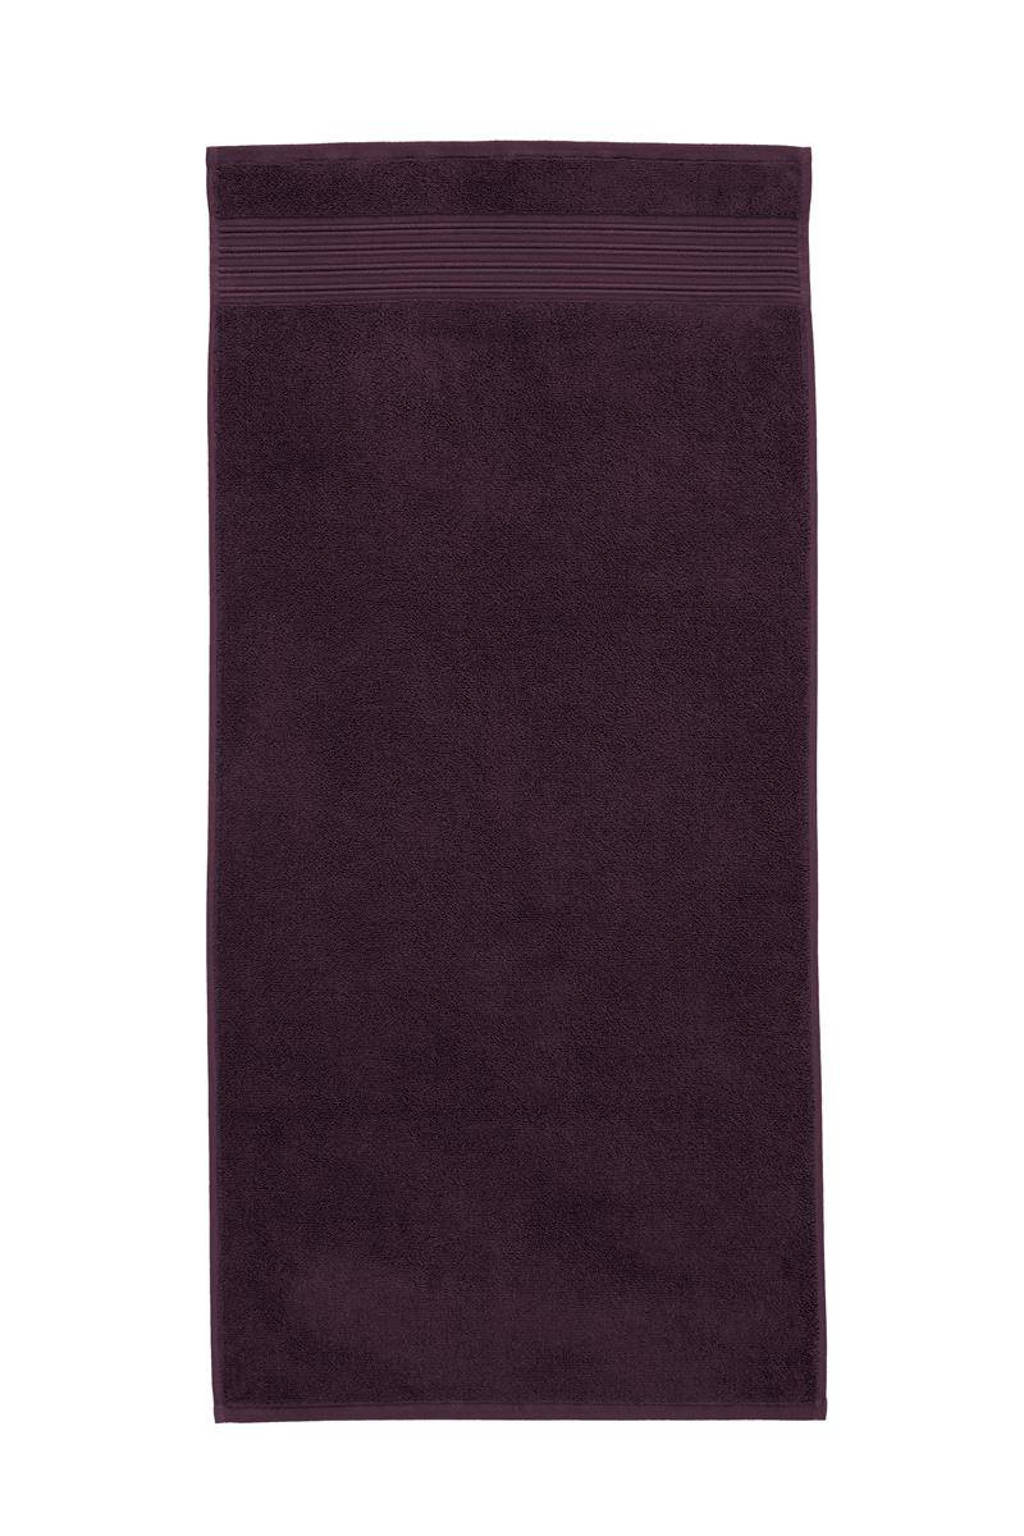 Beddinghouse handdoek (100 x 55 cm) Donkerrood